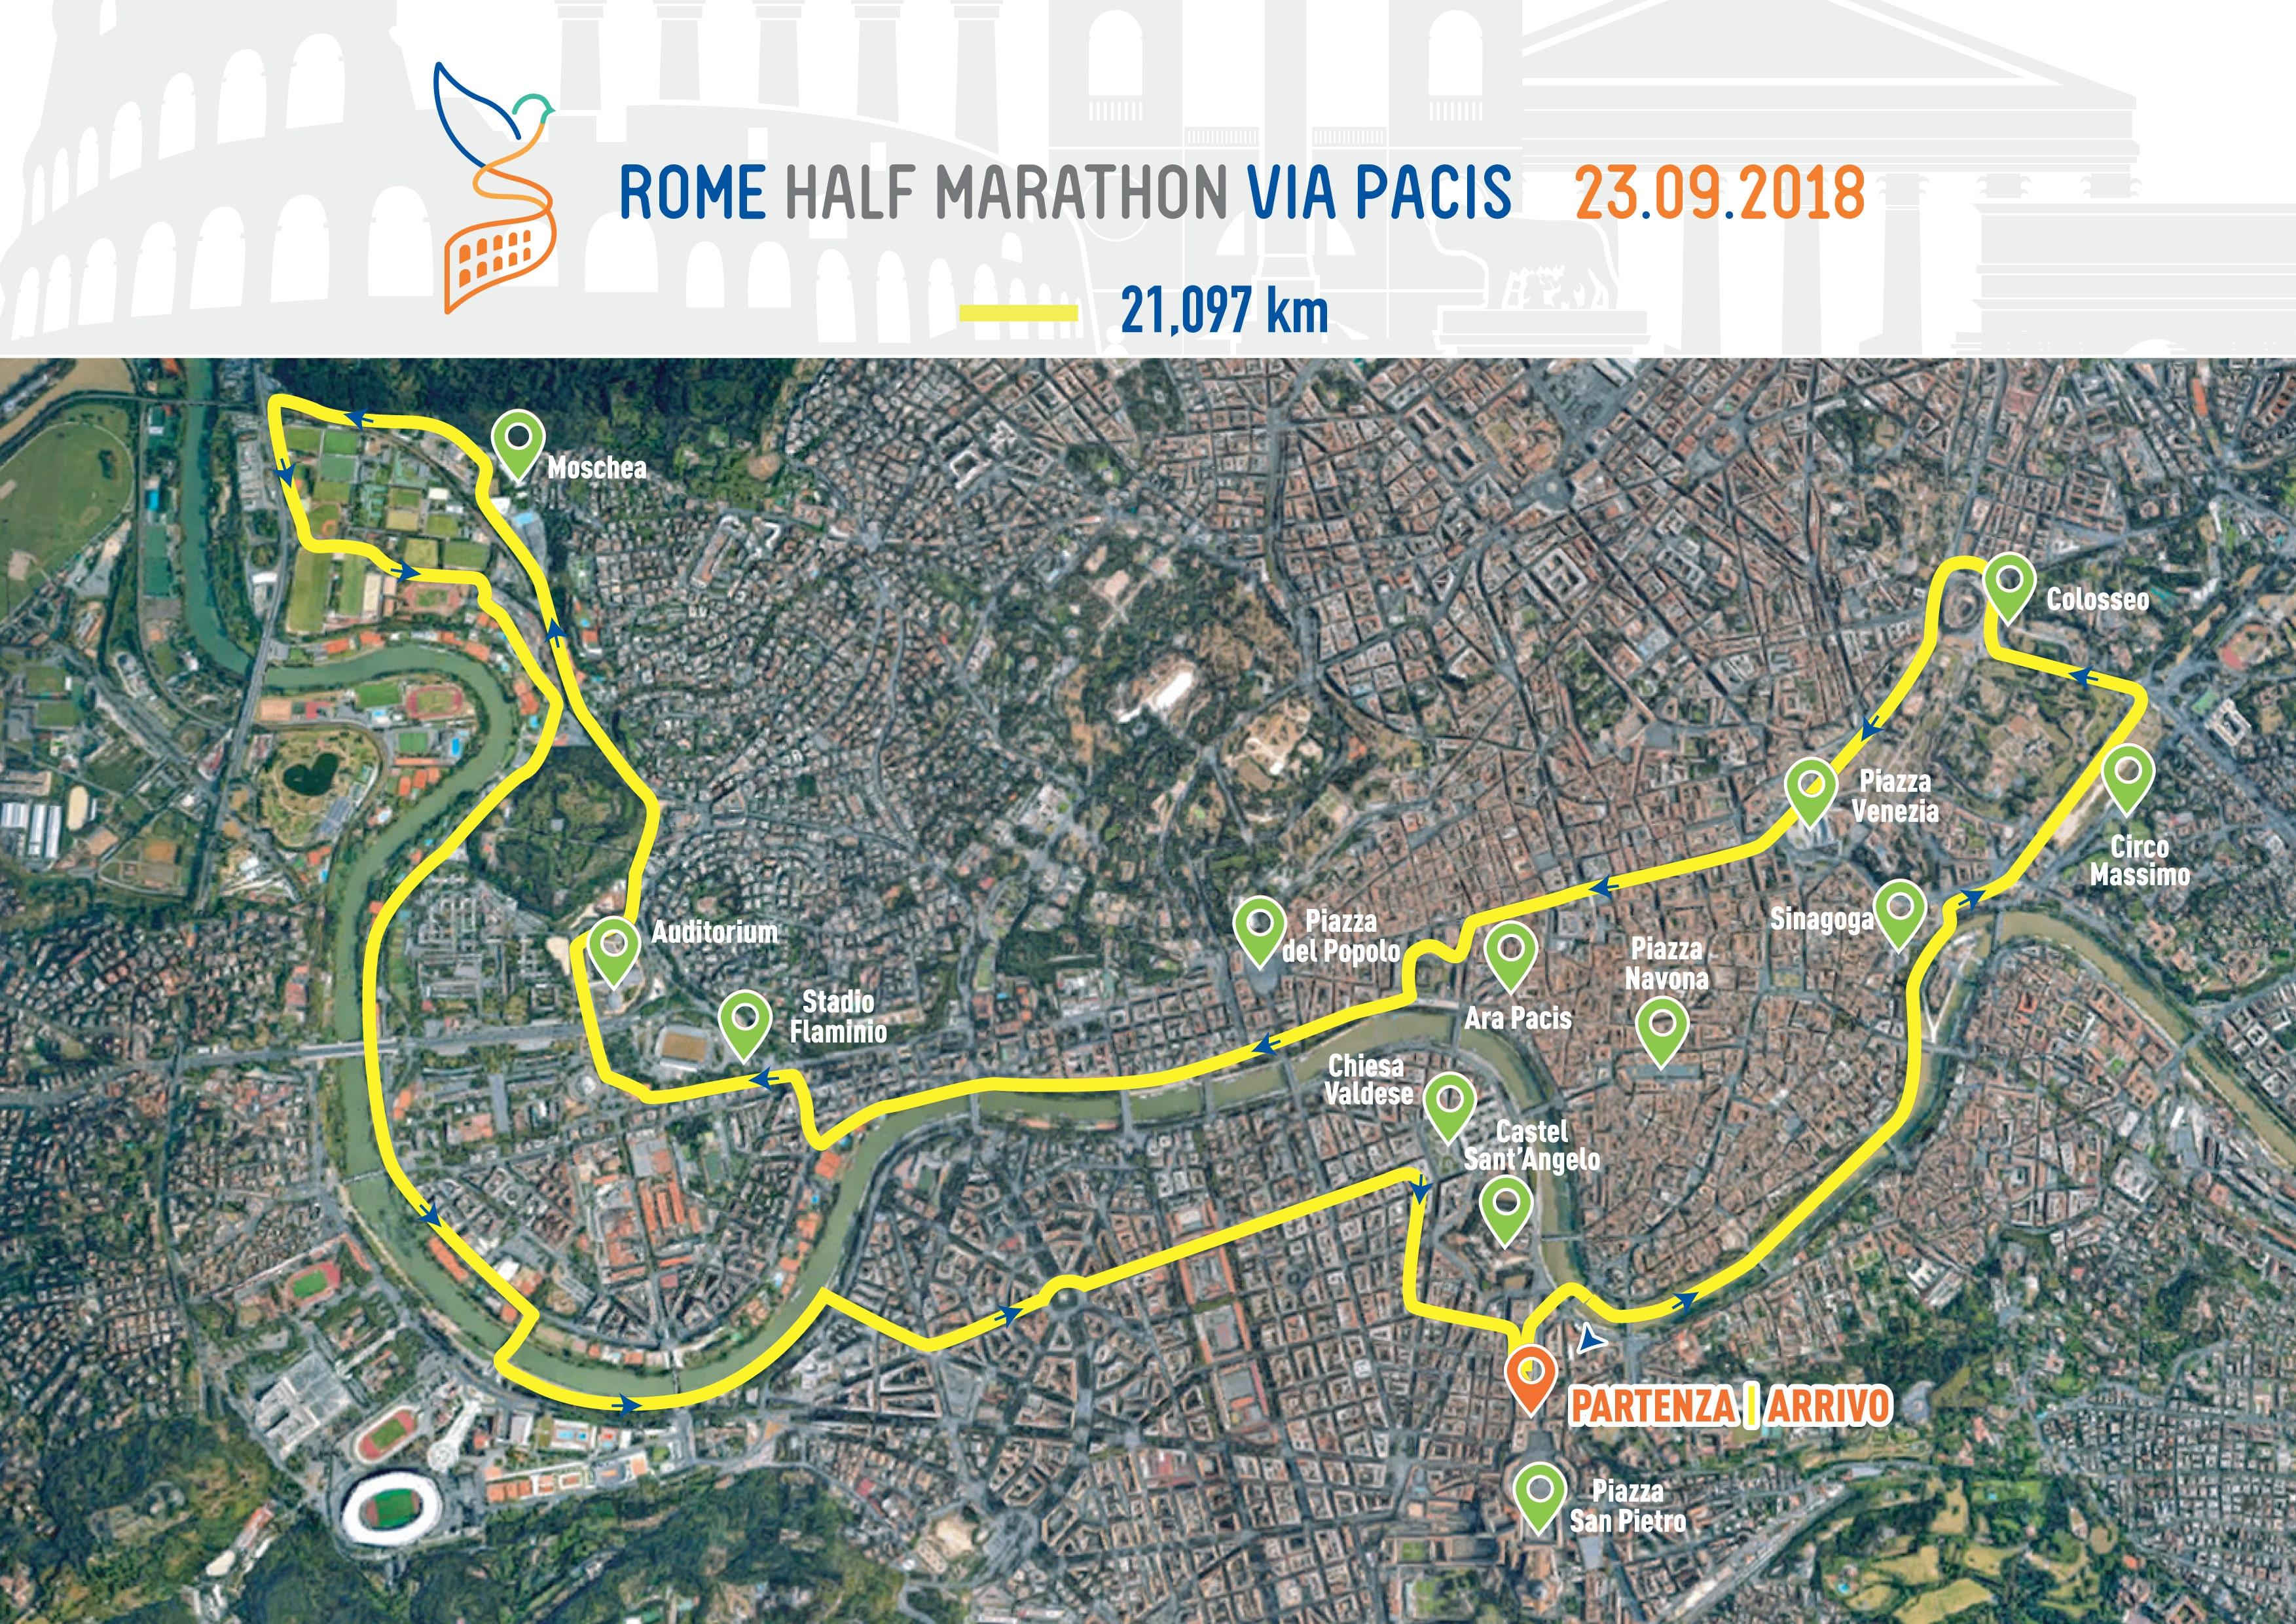 Roma Half Marathon 2018 strade chiuse